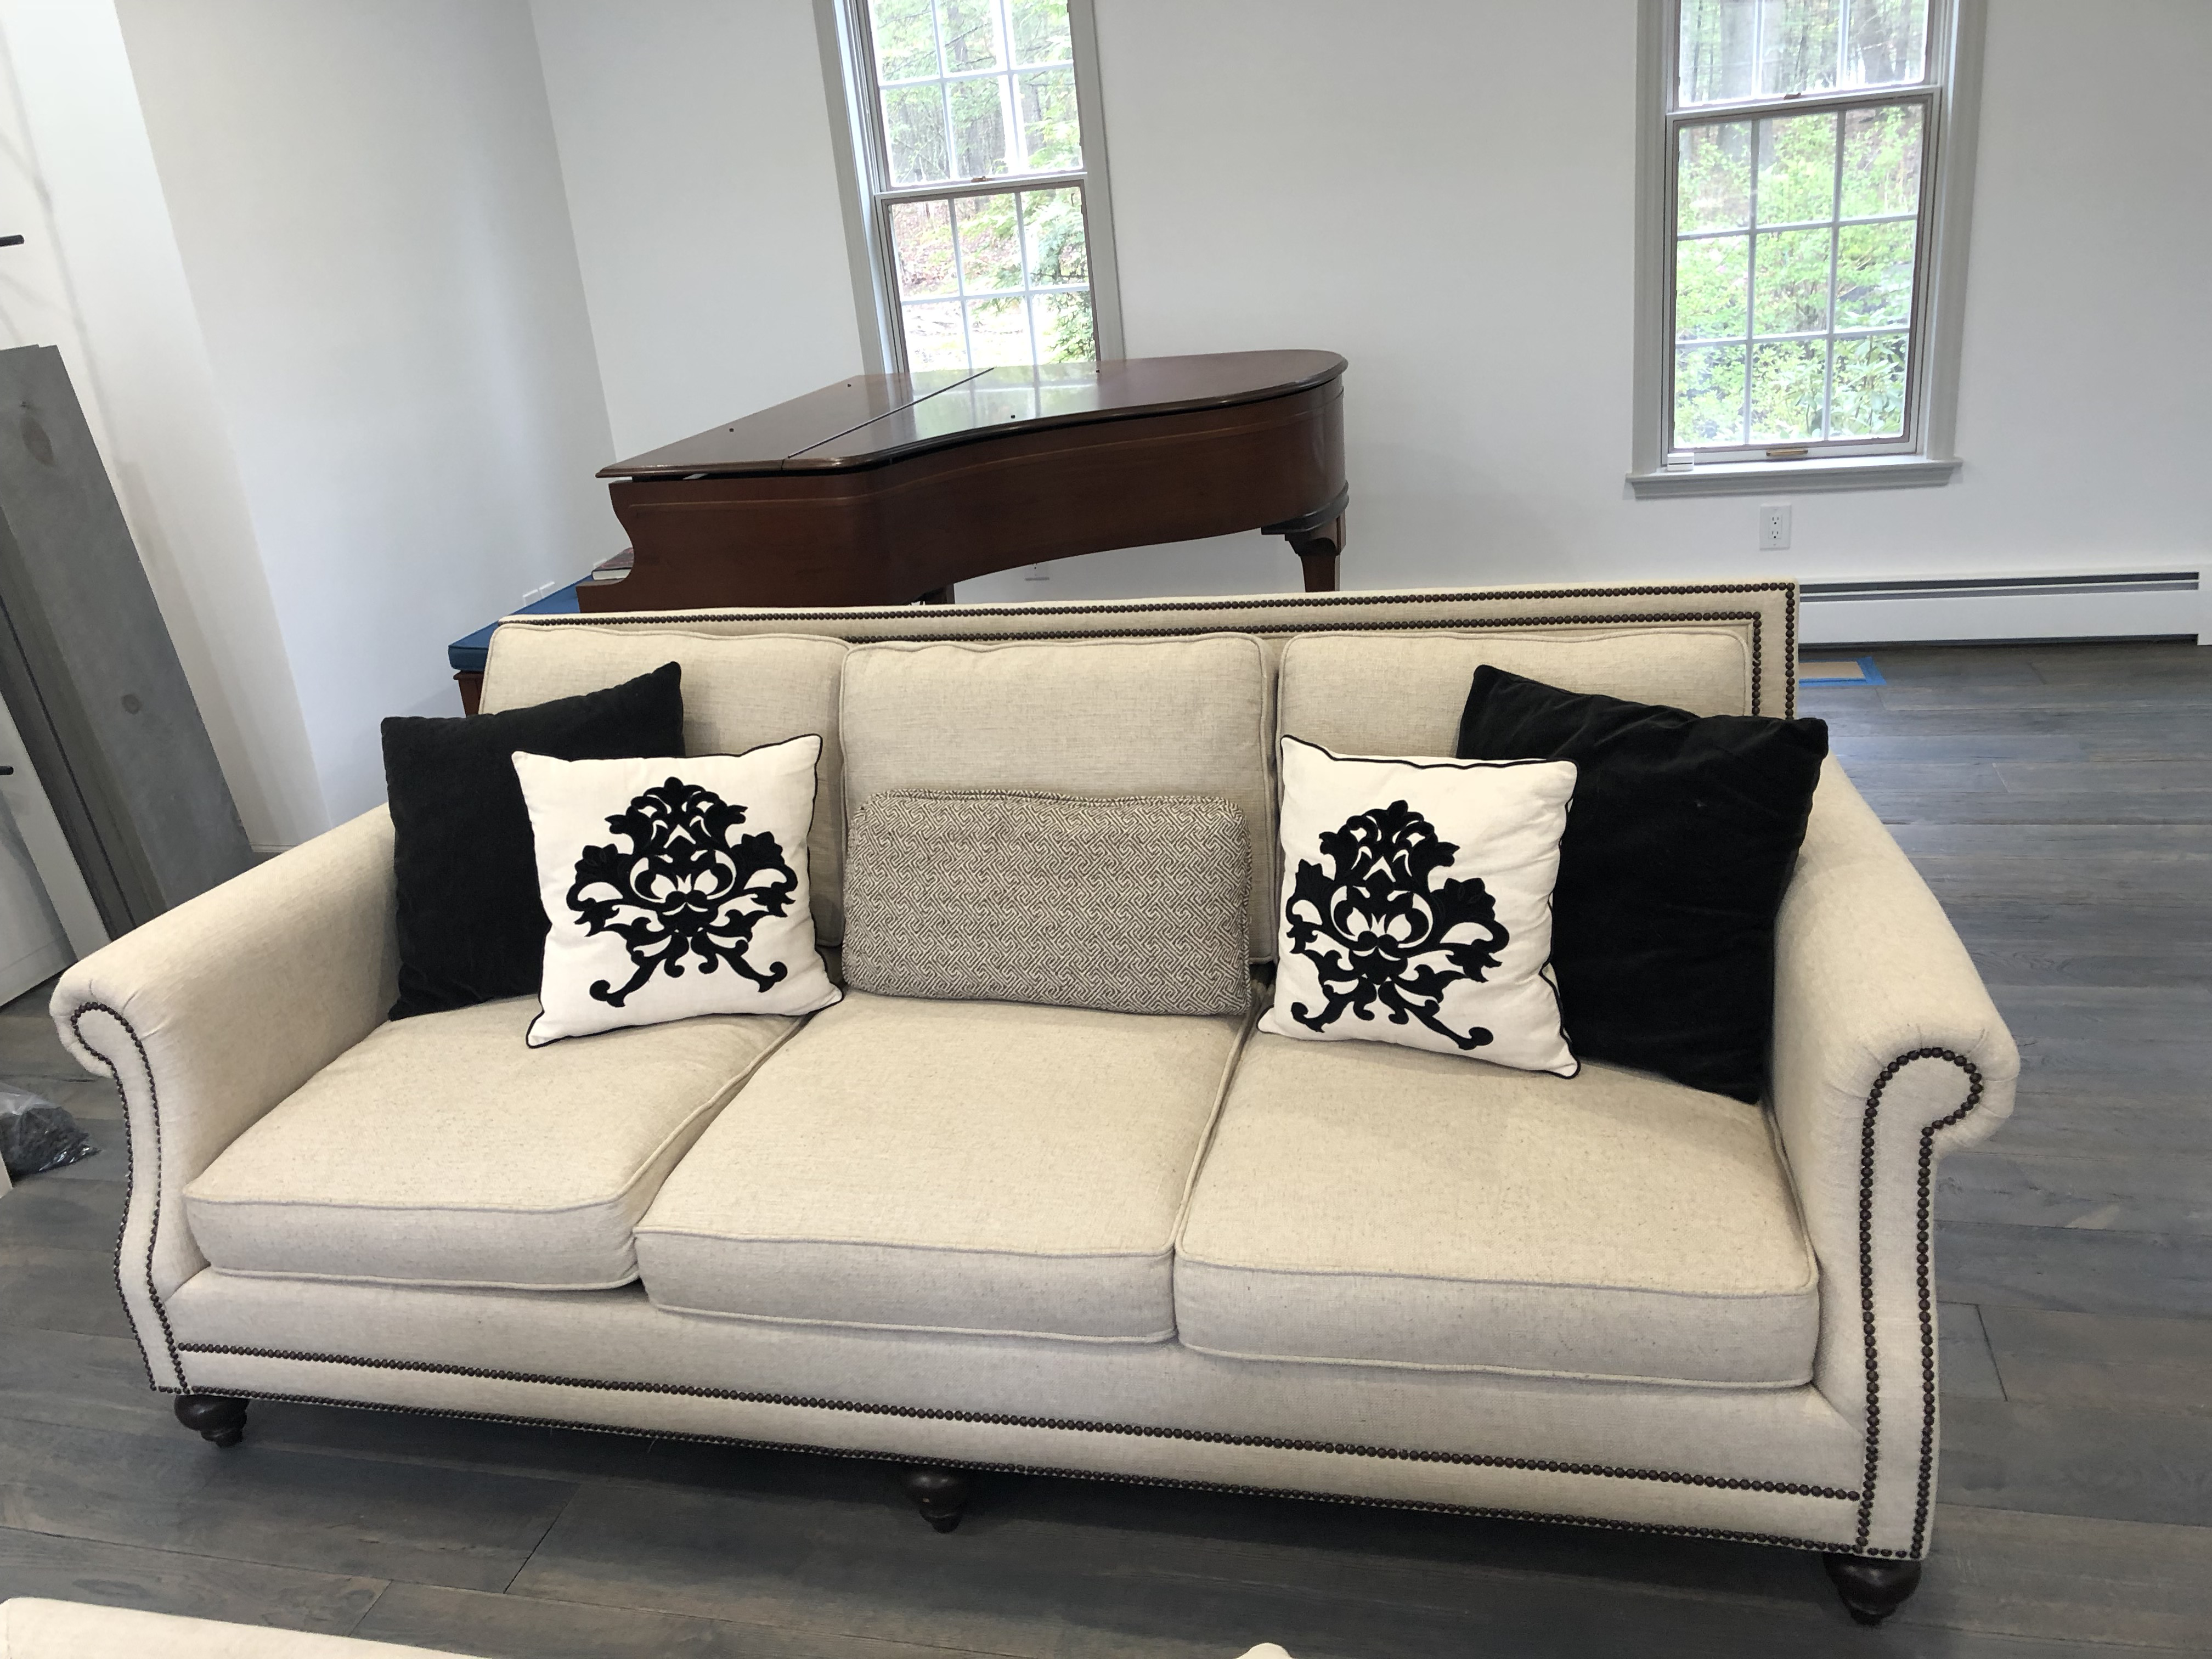 Fabric Safavieh Brae Nailhead Trim Sofa For Sale   Image 7 Of 12